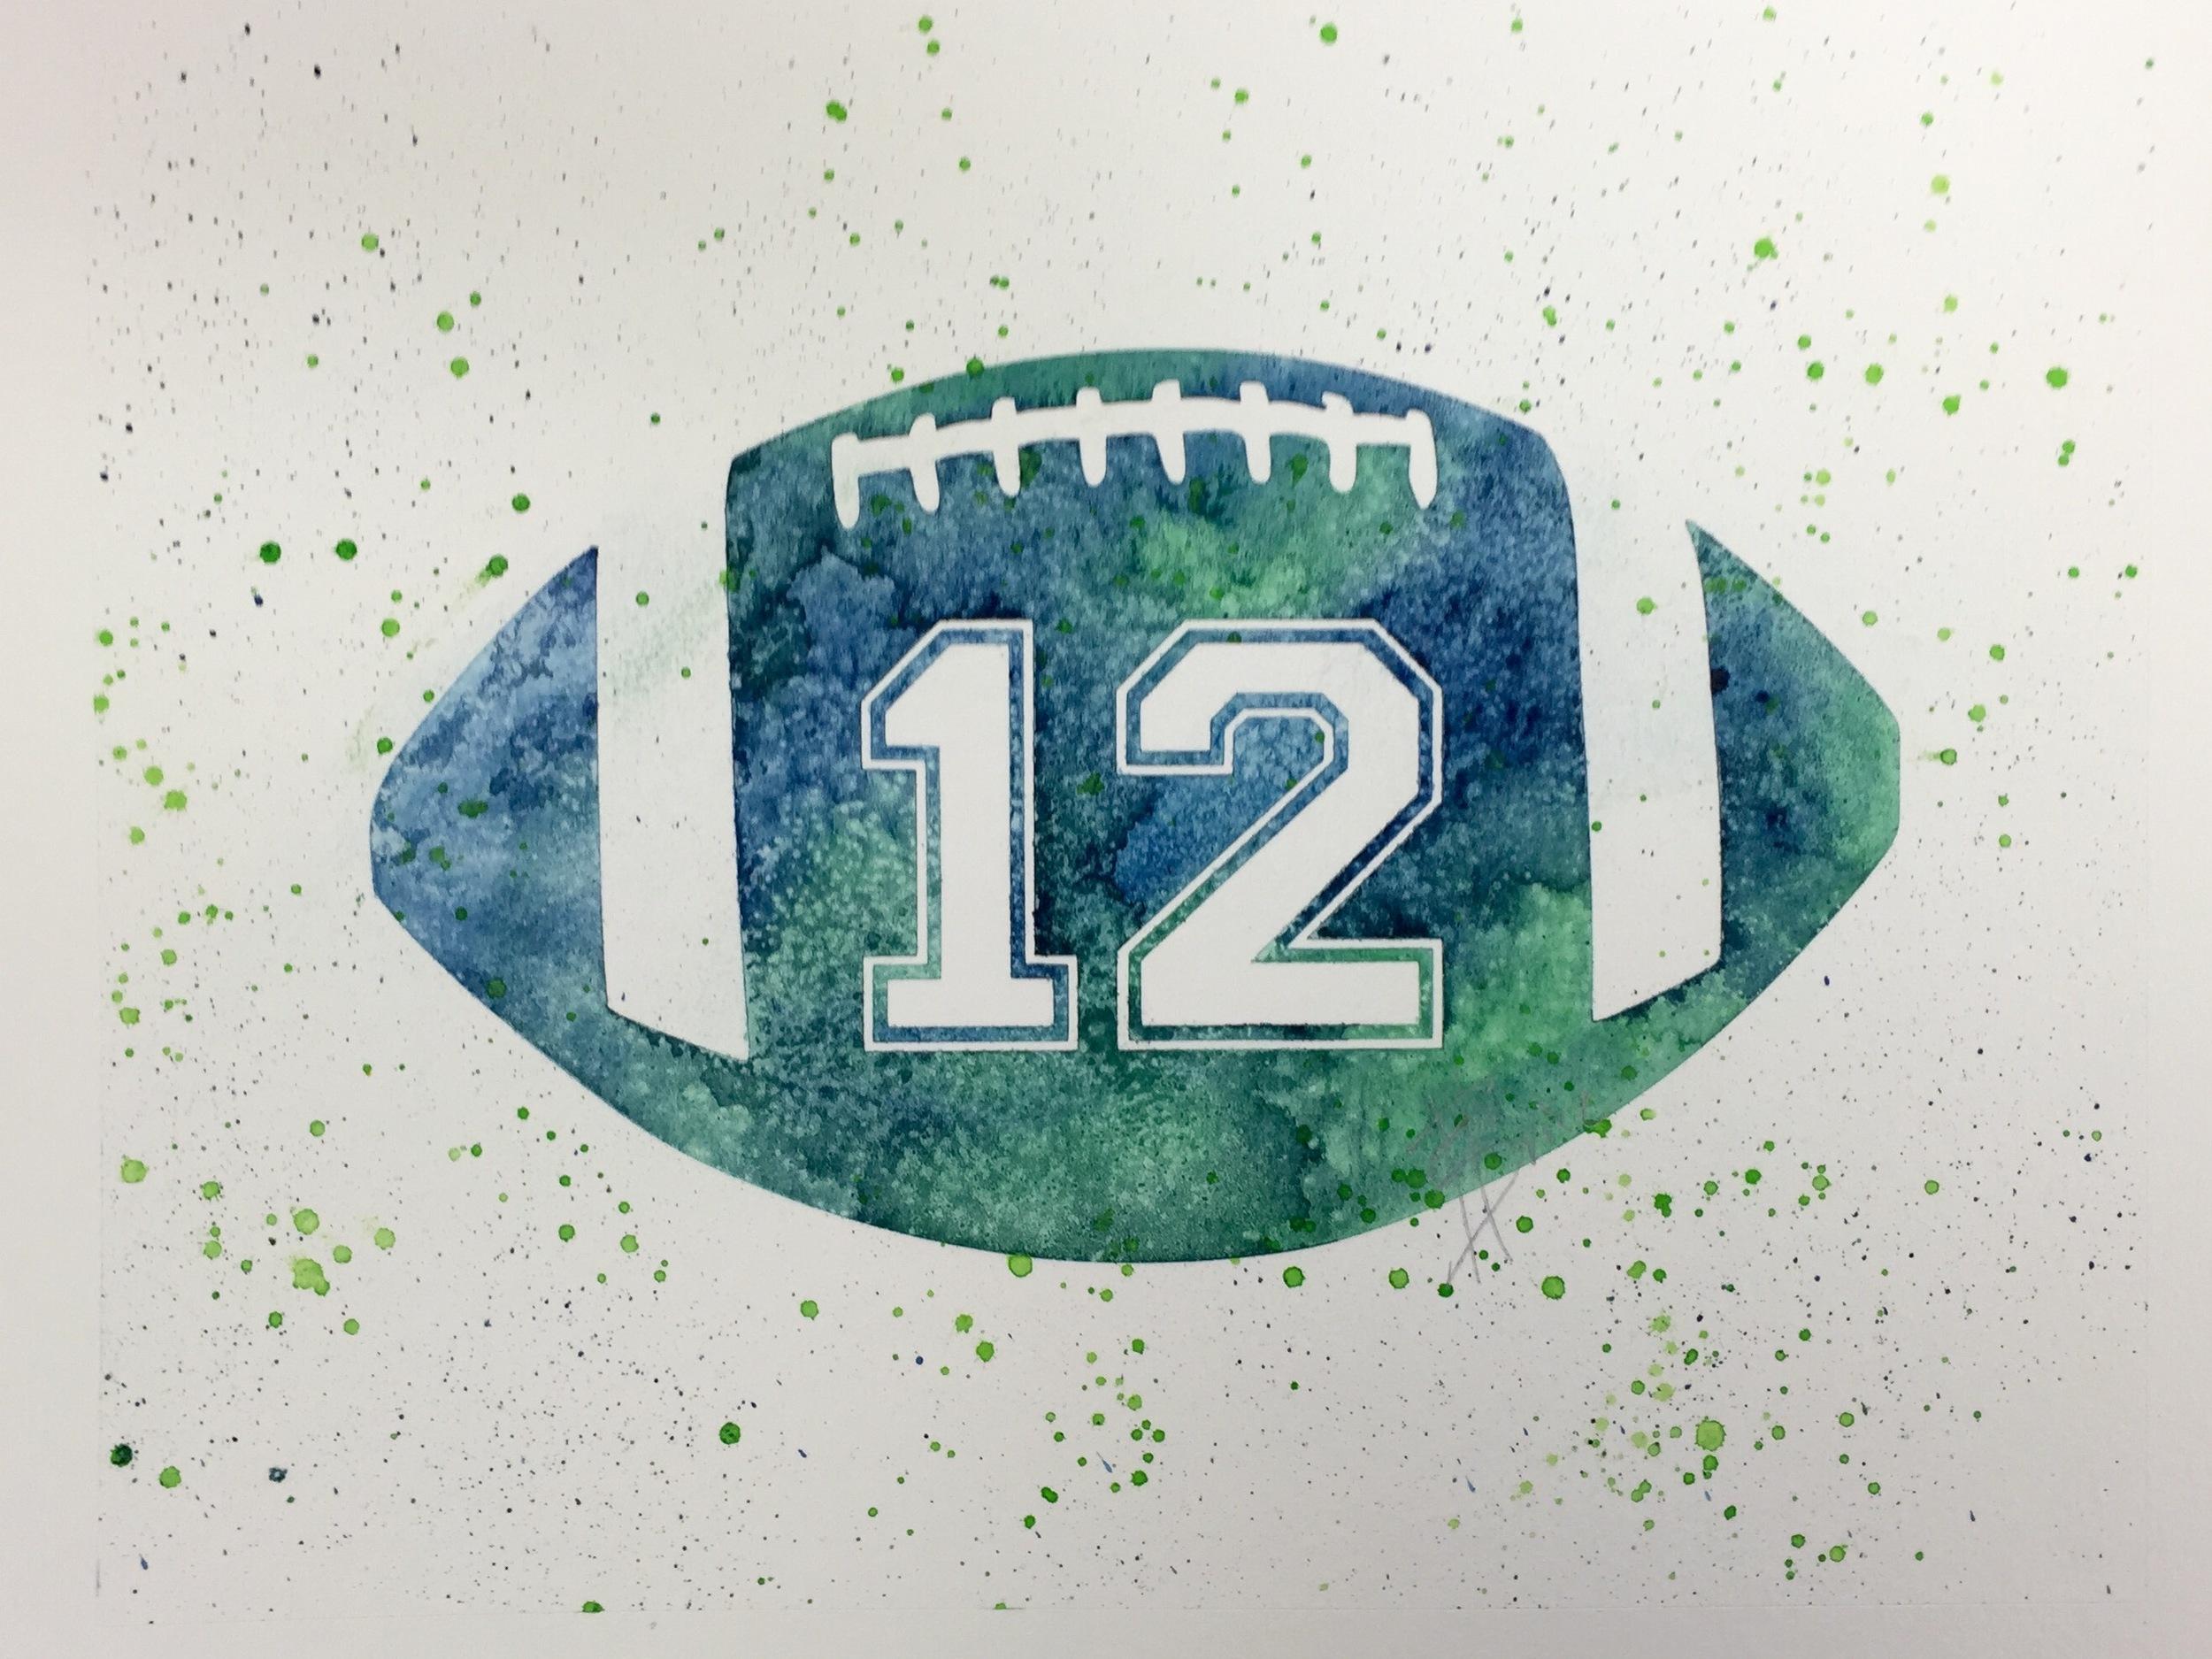 Football 12